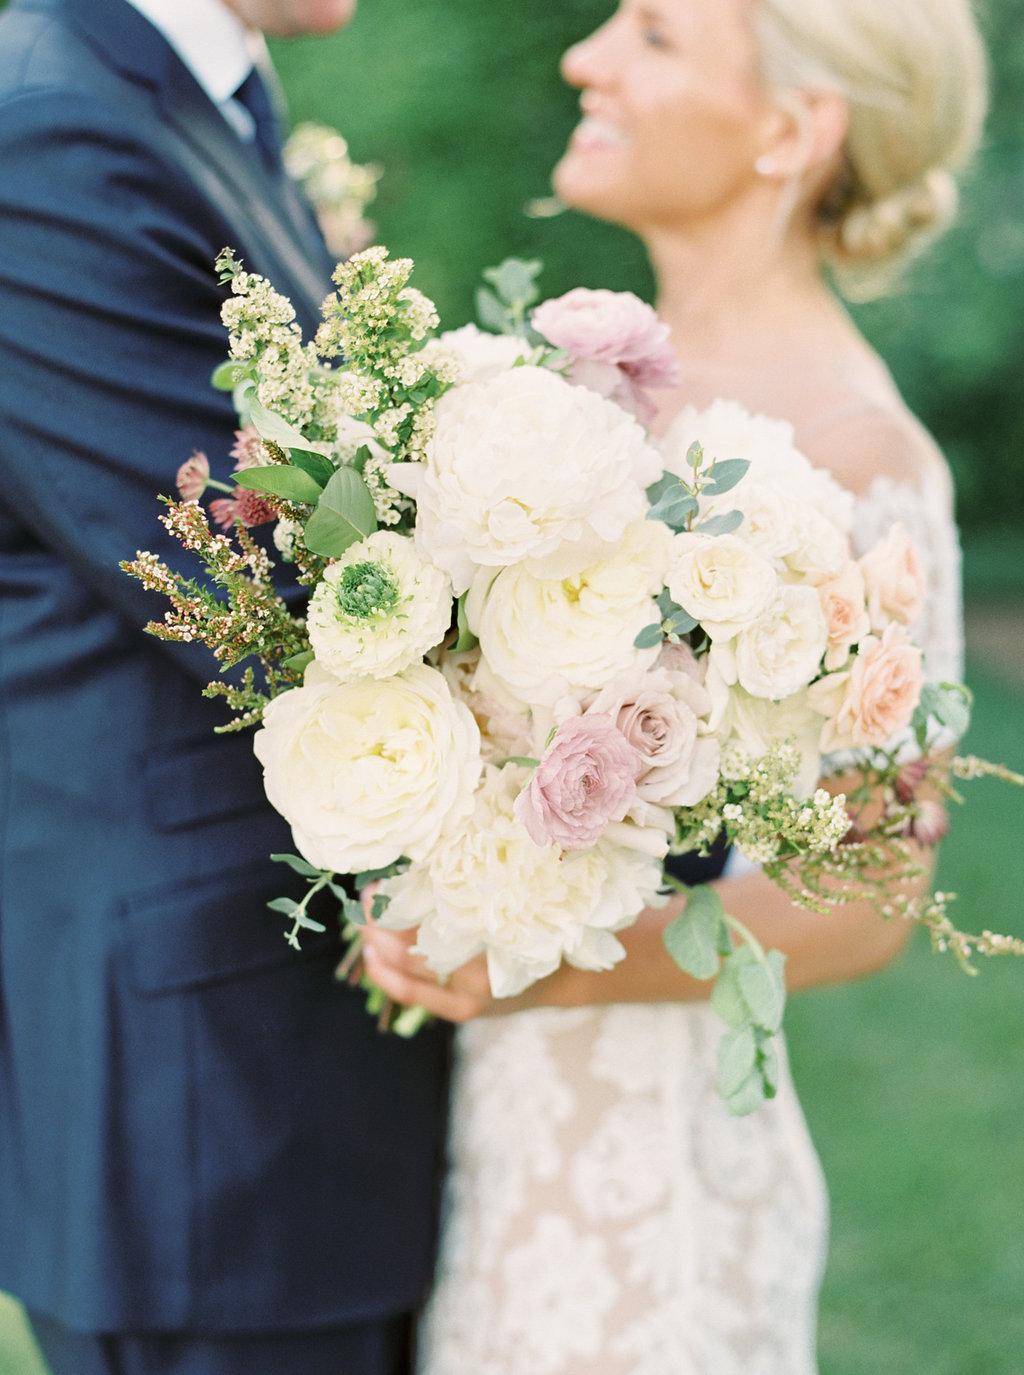 alegria-by-design-wedding-planner-planning-event-design-santa-barbara-day-of-coordinator-kestrel-park-santa-ynez-fields-castle-lavender-garden-mrs-box (30).jpg